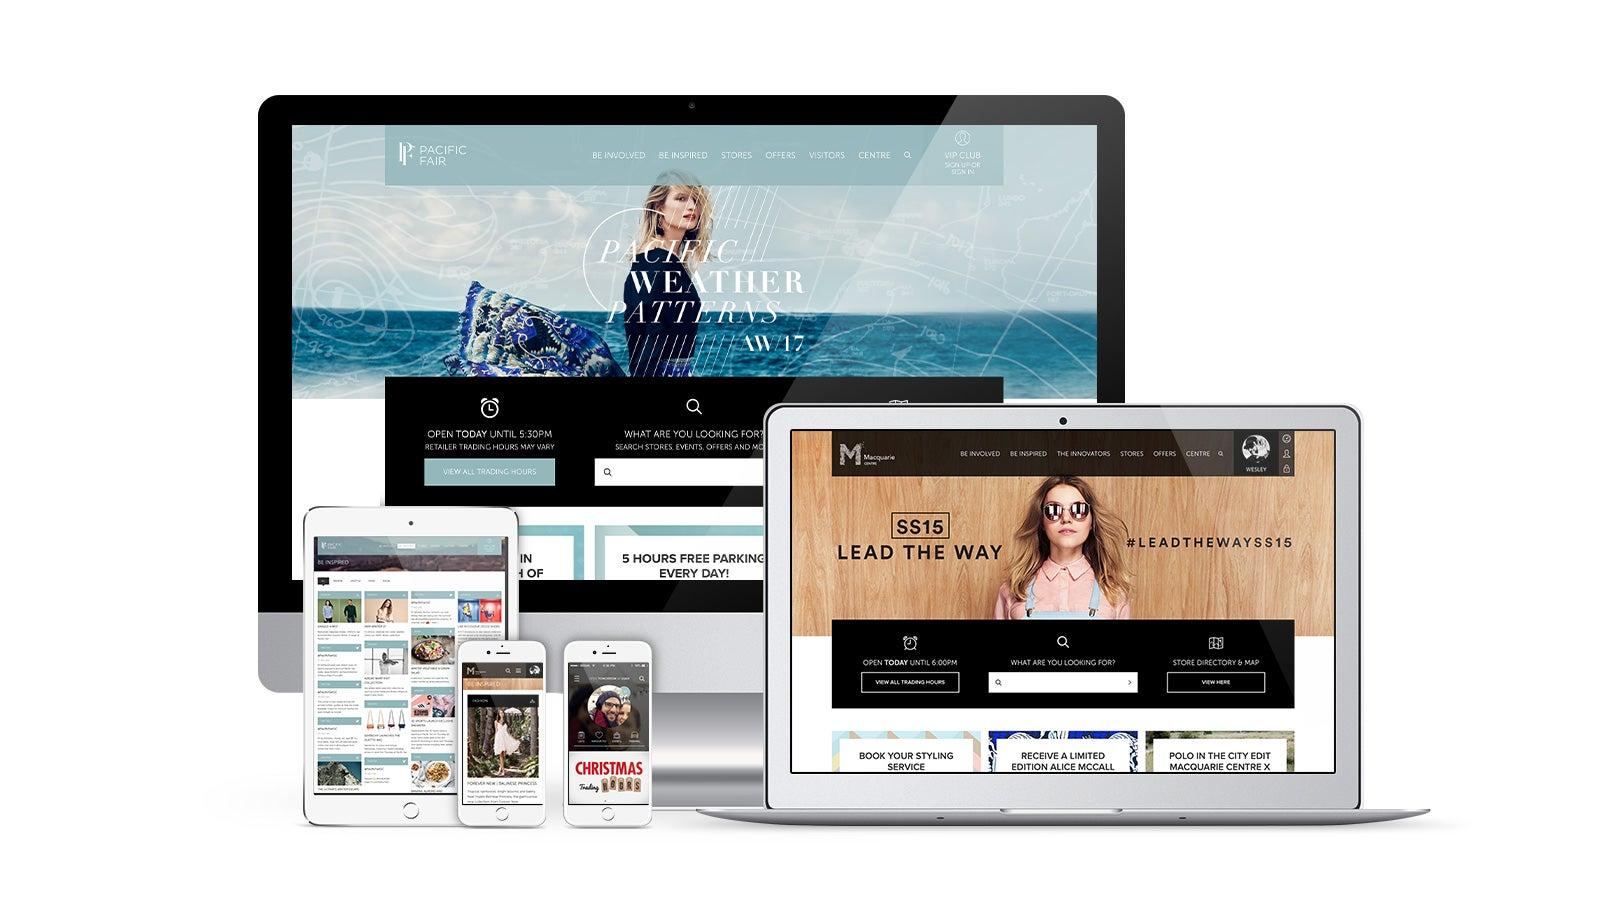 AMP   Pacific Fair and Macquarie Centre responsive websites on desktop, laptop, tablet and mobile   Devotion